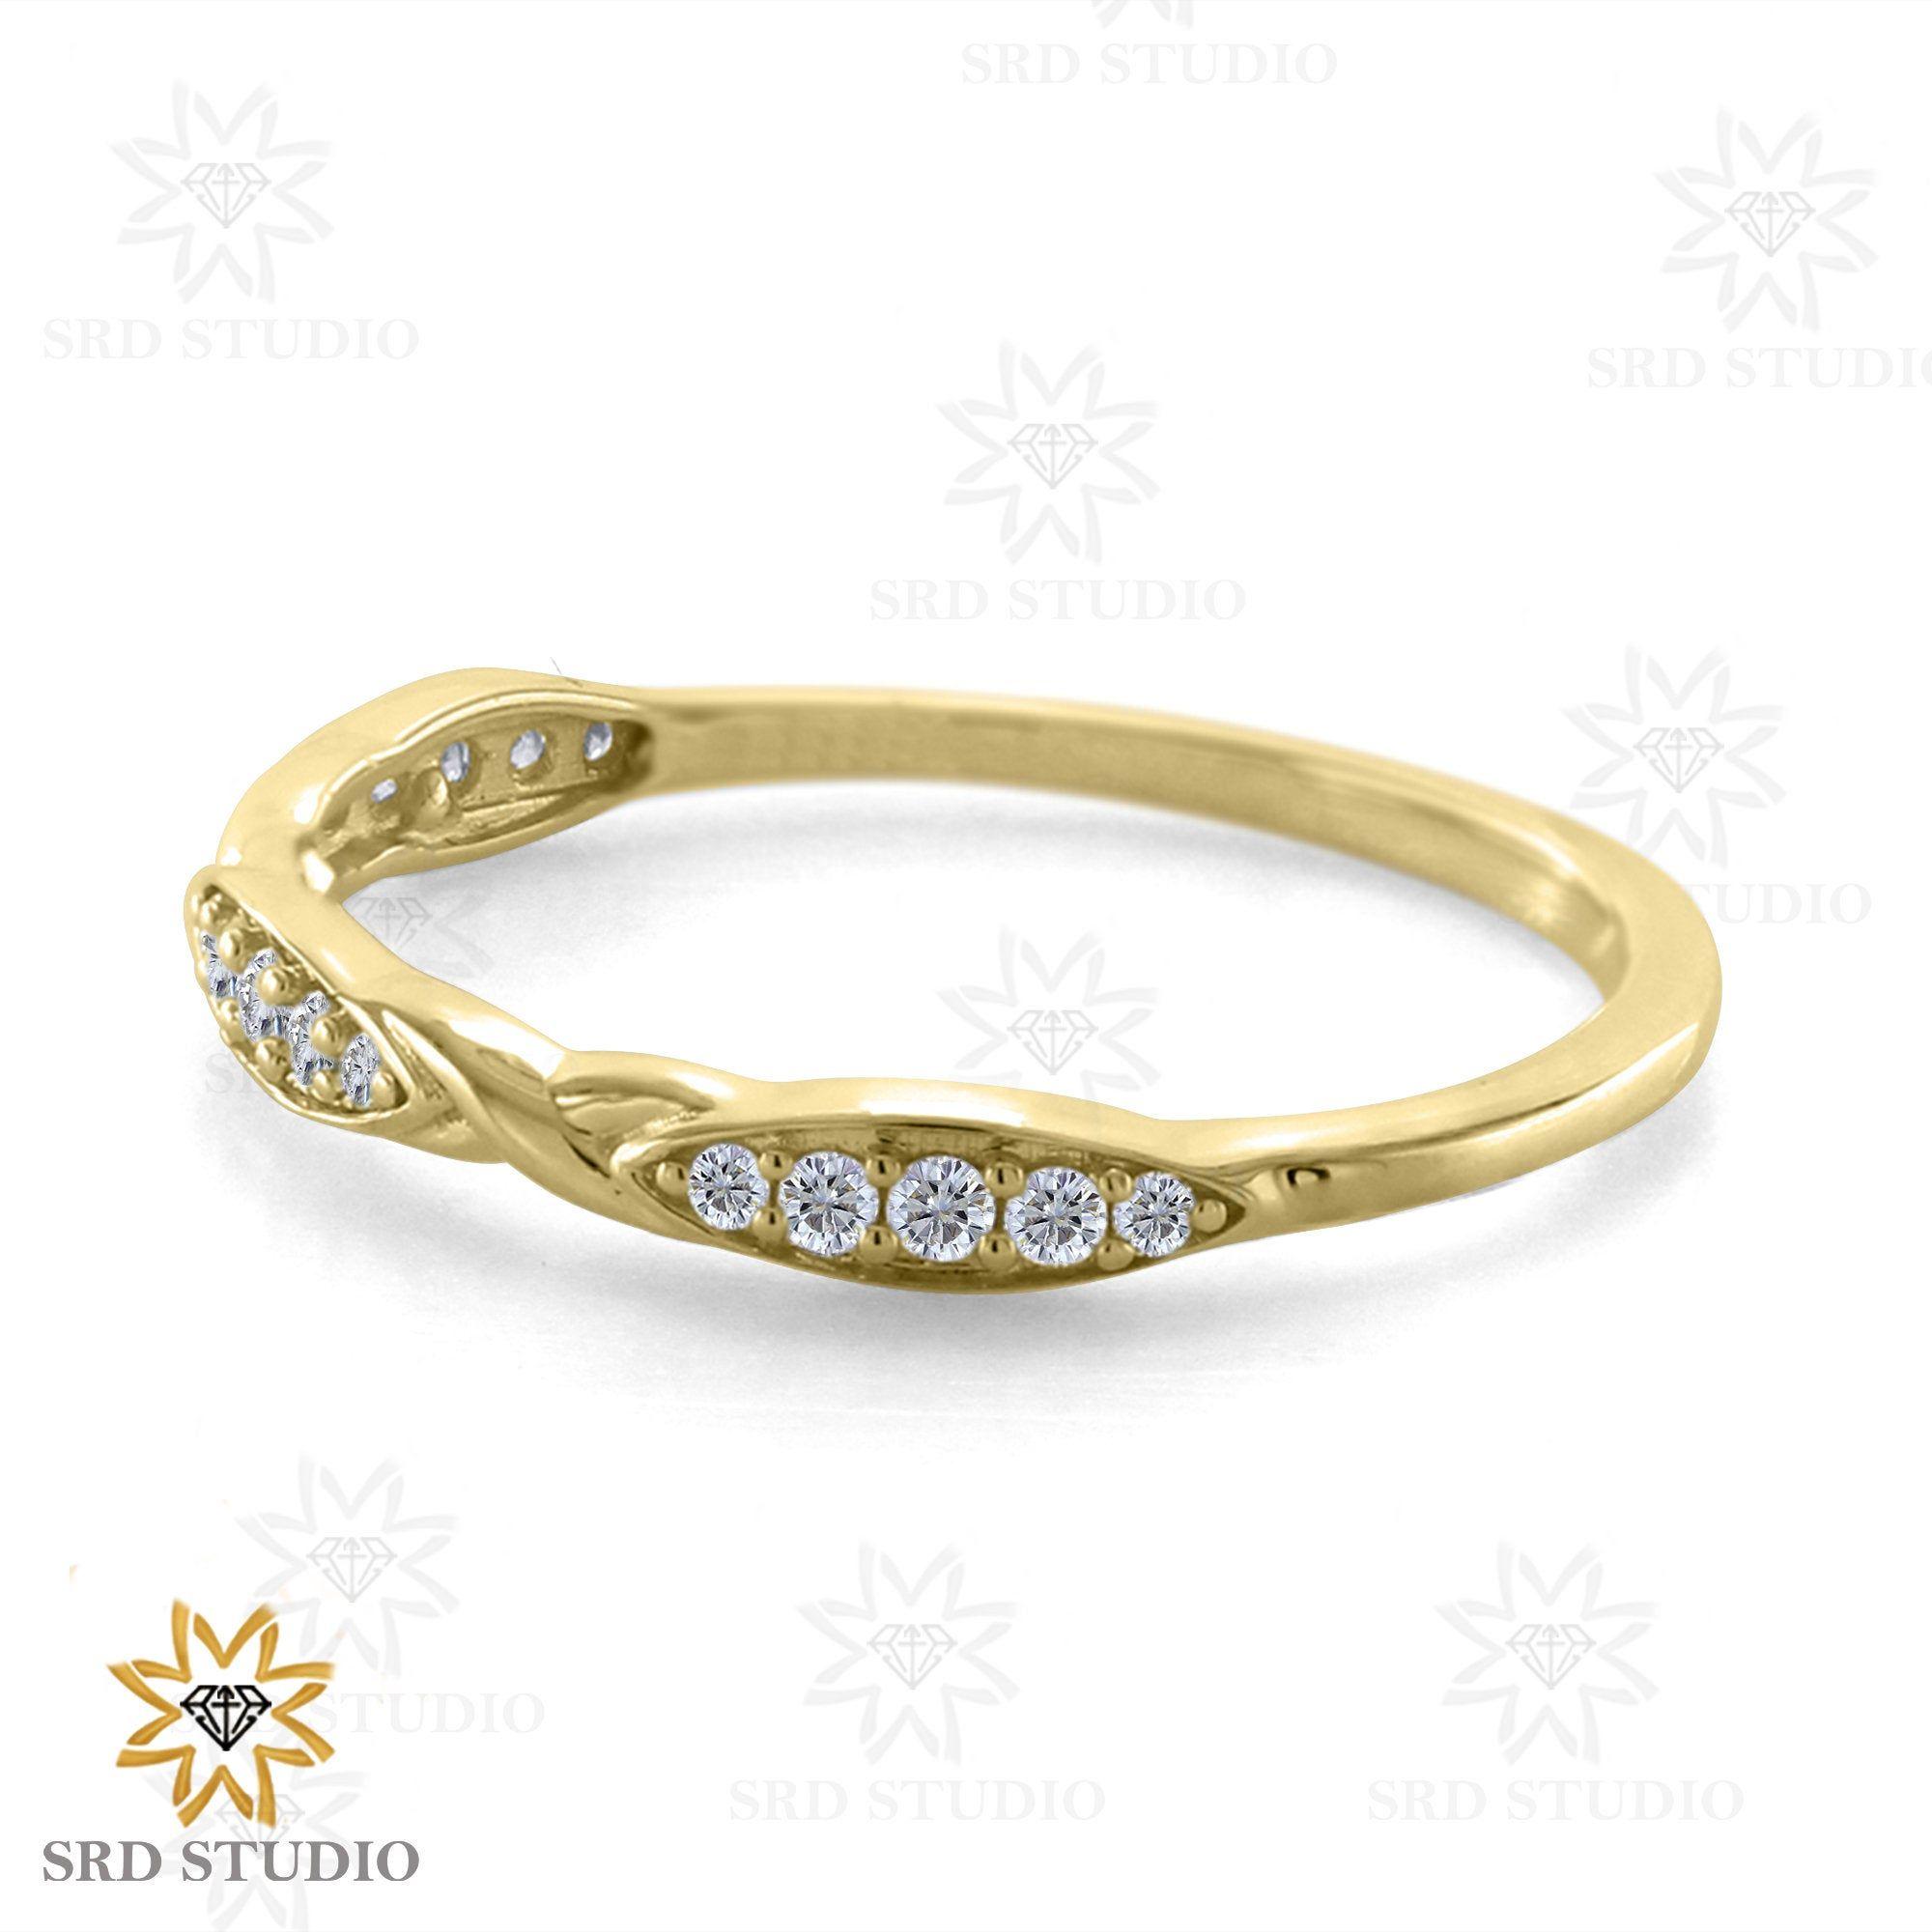 Anniversary band,Proposal  Gold ring,GIFT  band Yellow GOLD WEDDING  band